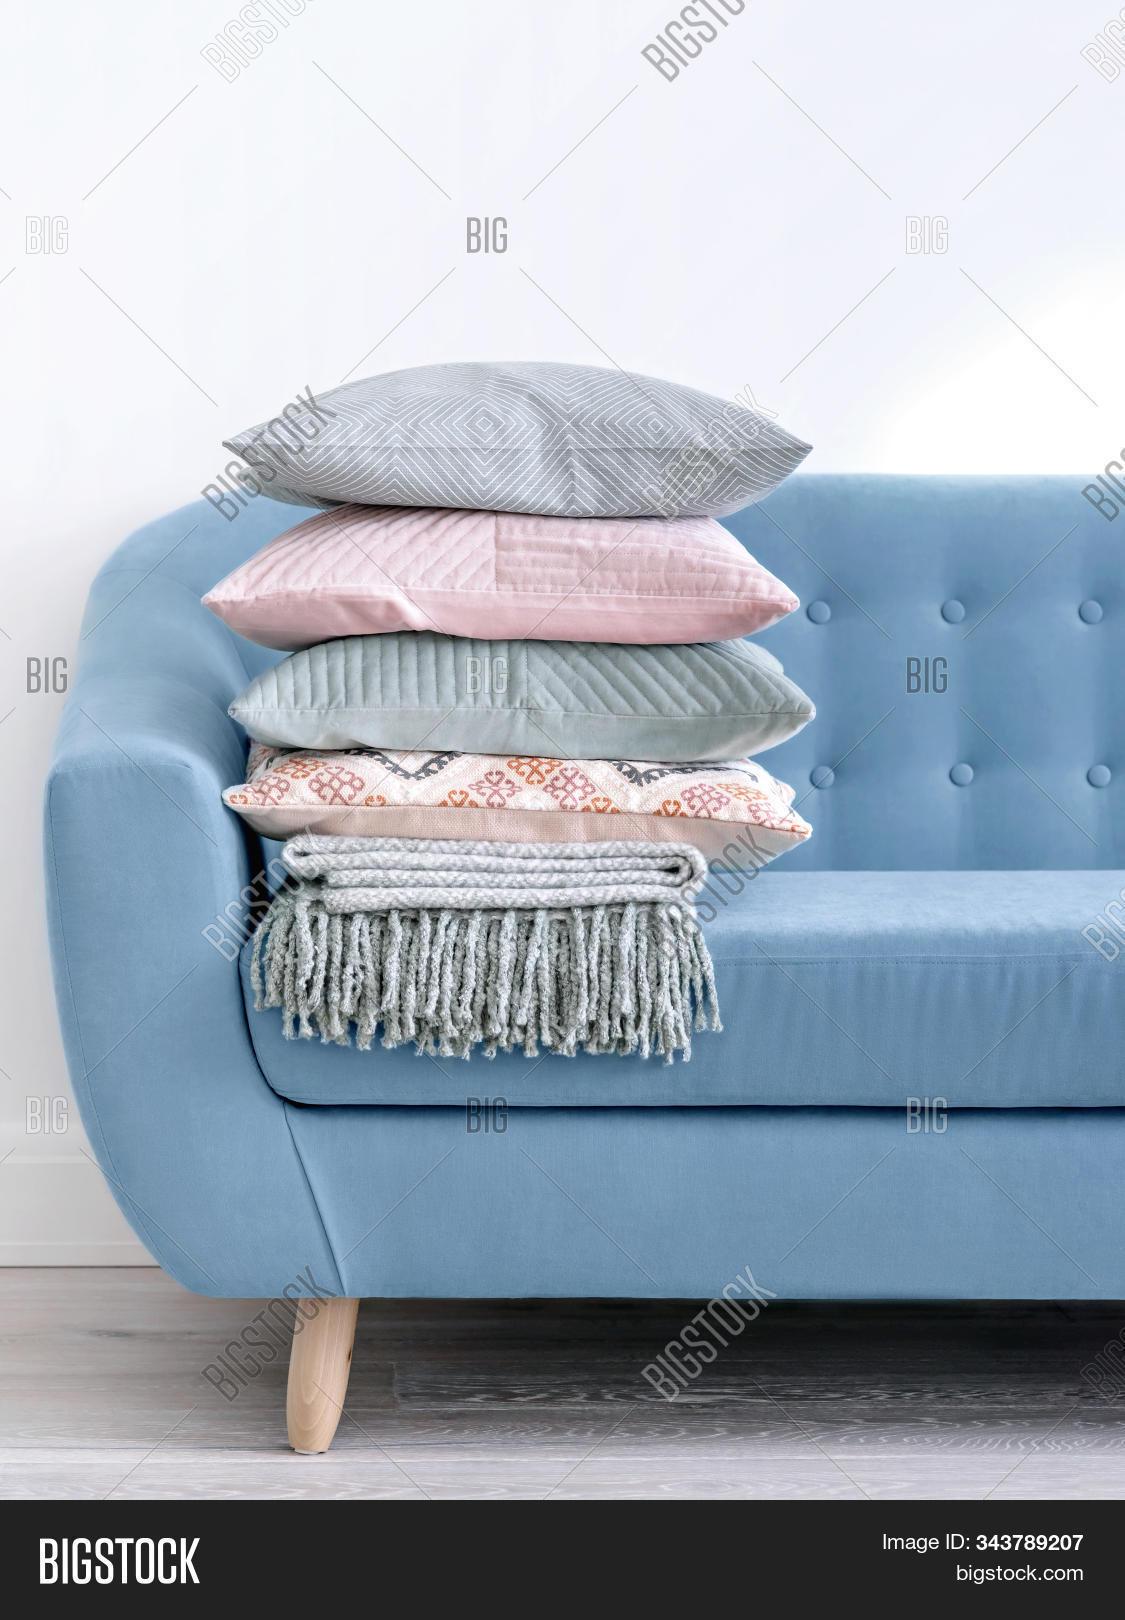 Trendy Denim Blue Sofa Image Photo Free Trial Bigstock